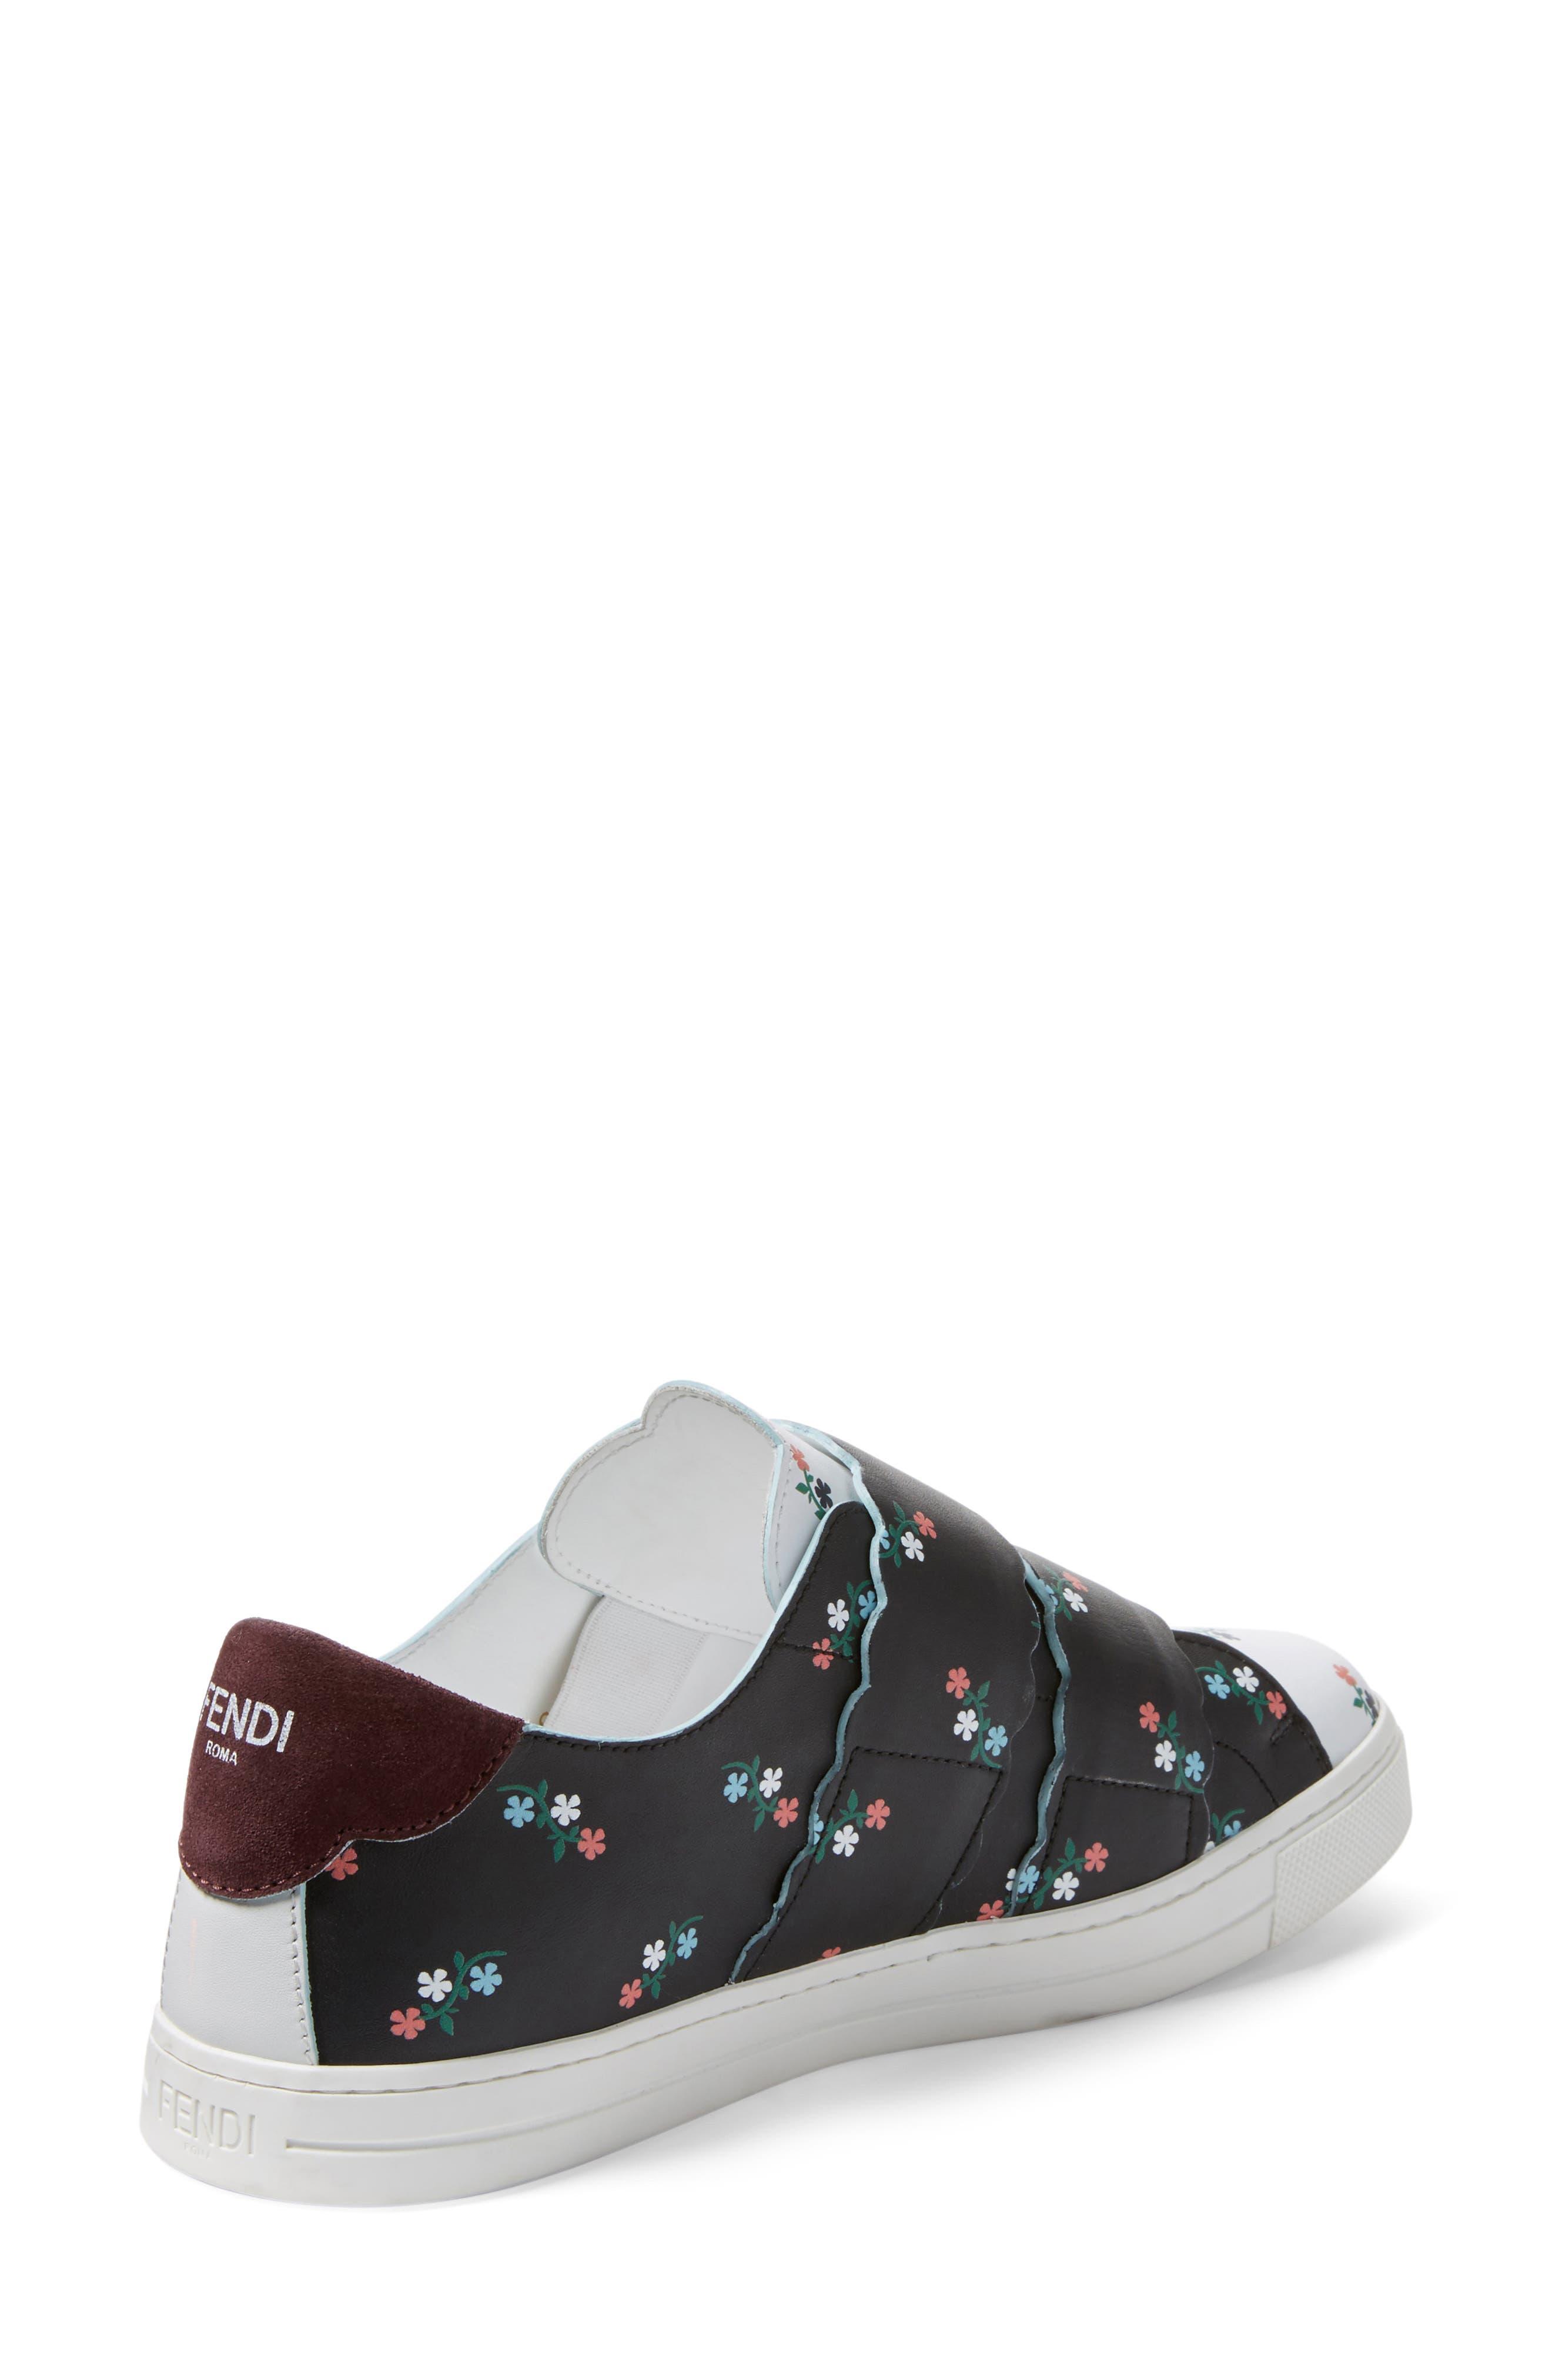 Scallop Sneaker,                             Alternate thumbnail 2, color,                             104